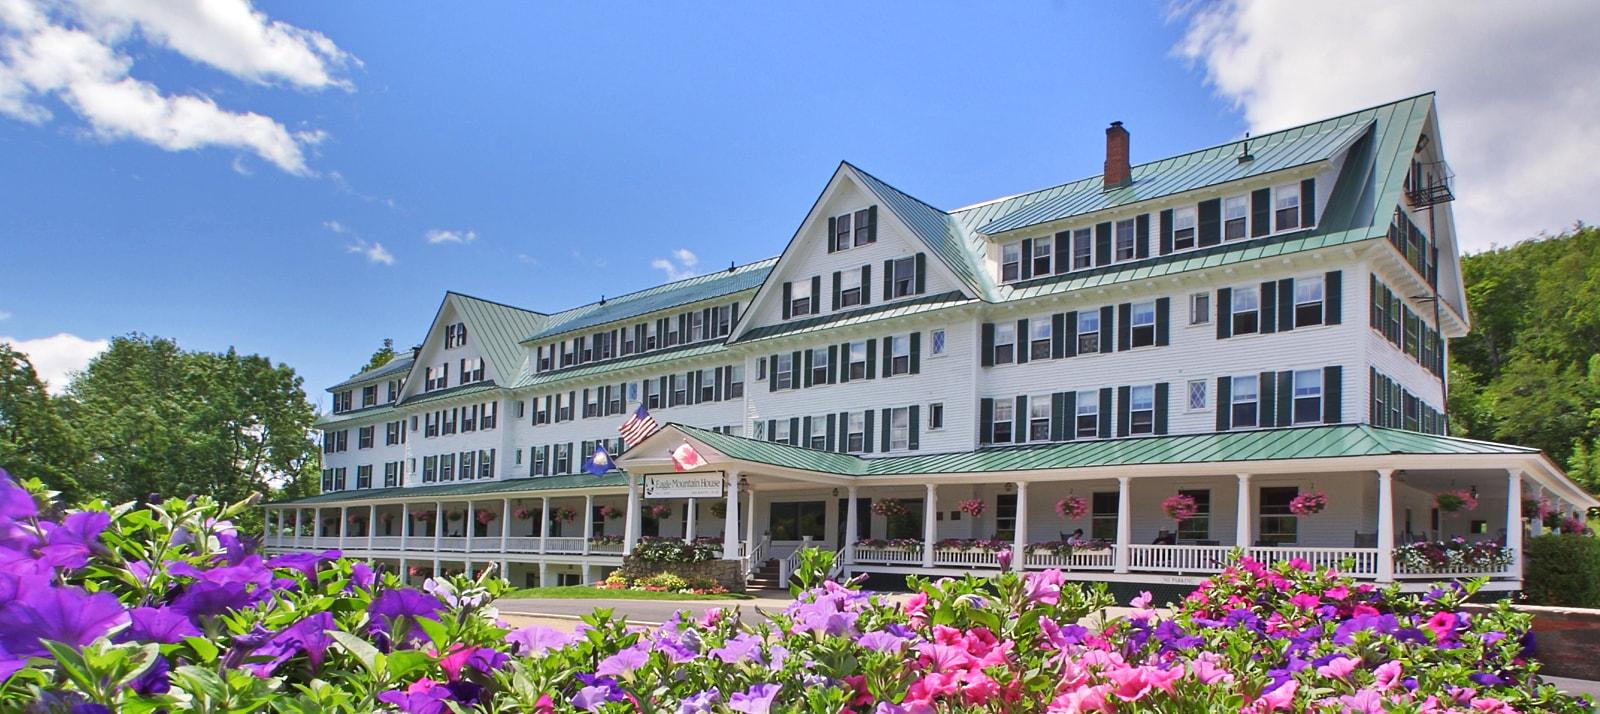 Eagle Mountain House - Jackson, New Hampshire